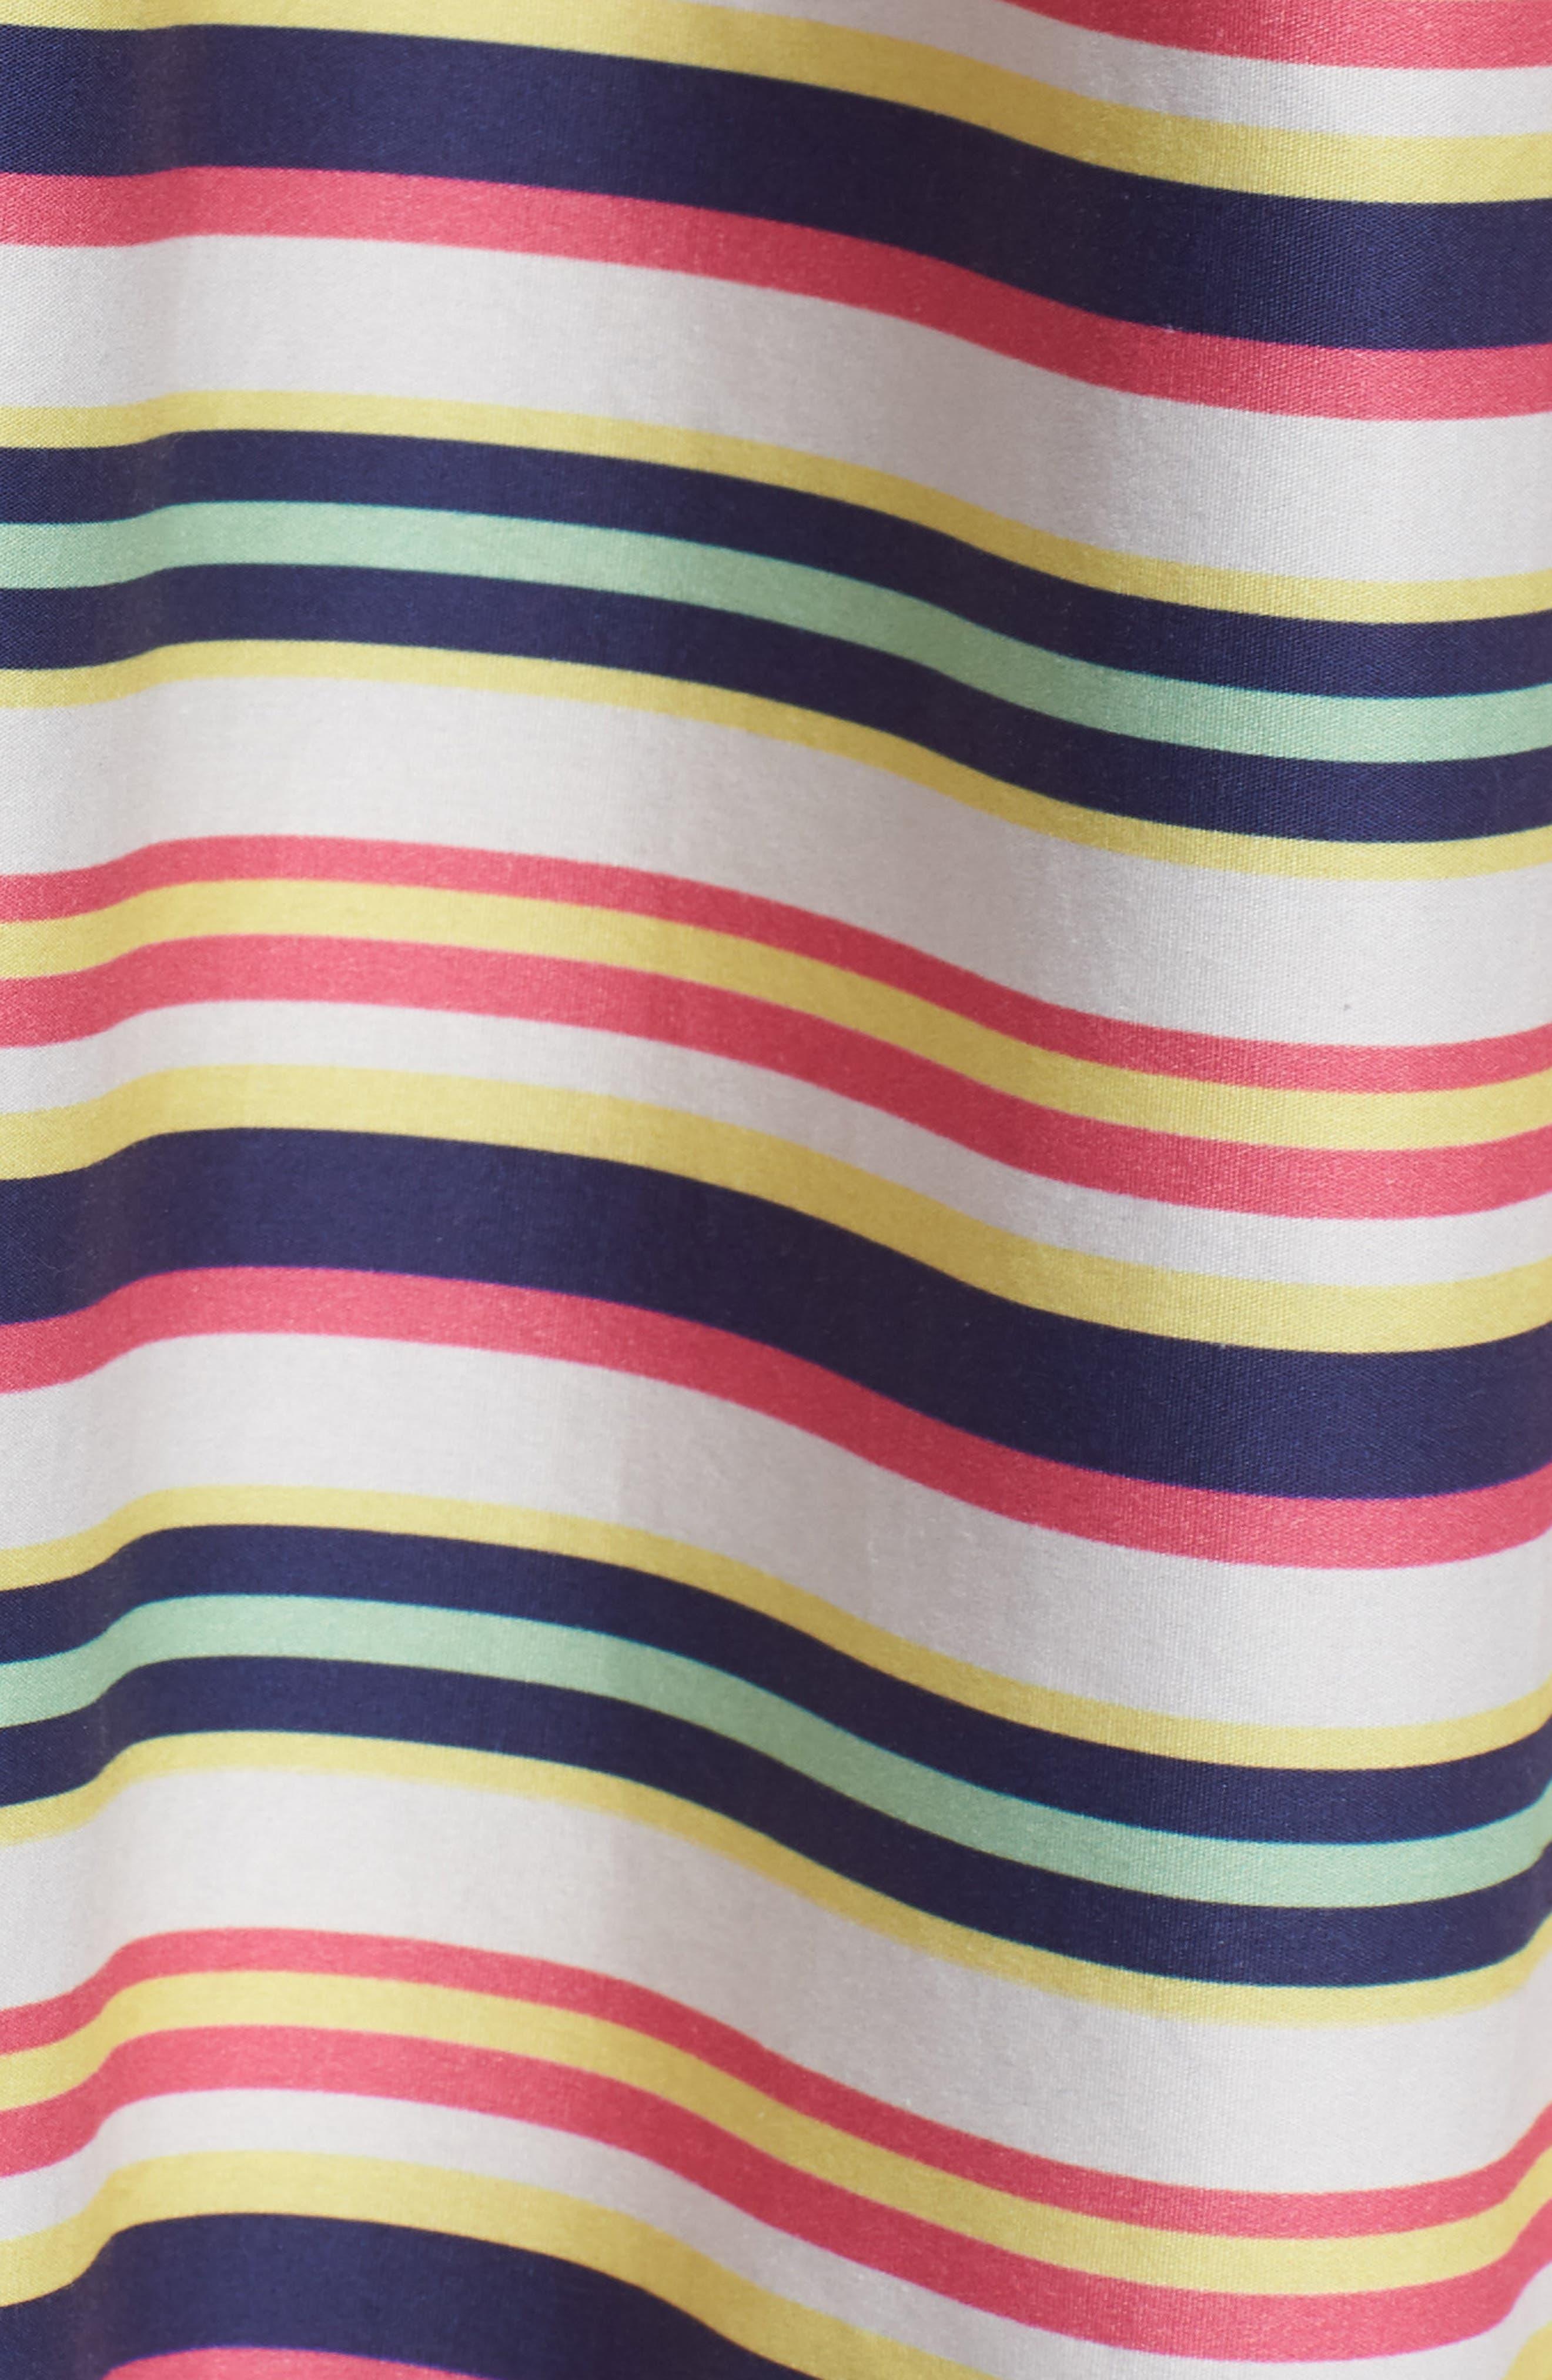 Stripe Strappy Cotton Dress,                             Alternate thumbnail 5, color,                             NAVY PINK COMBO STRIPE